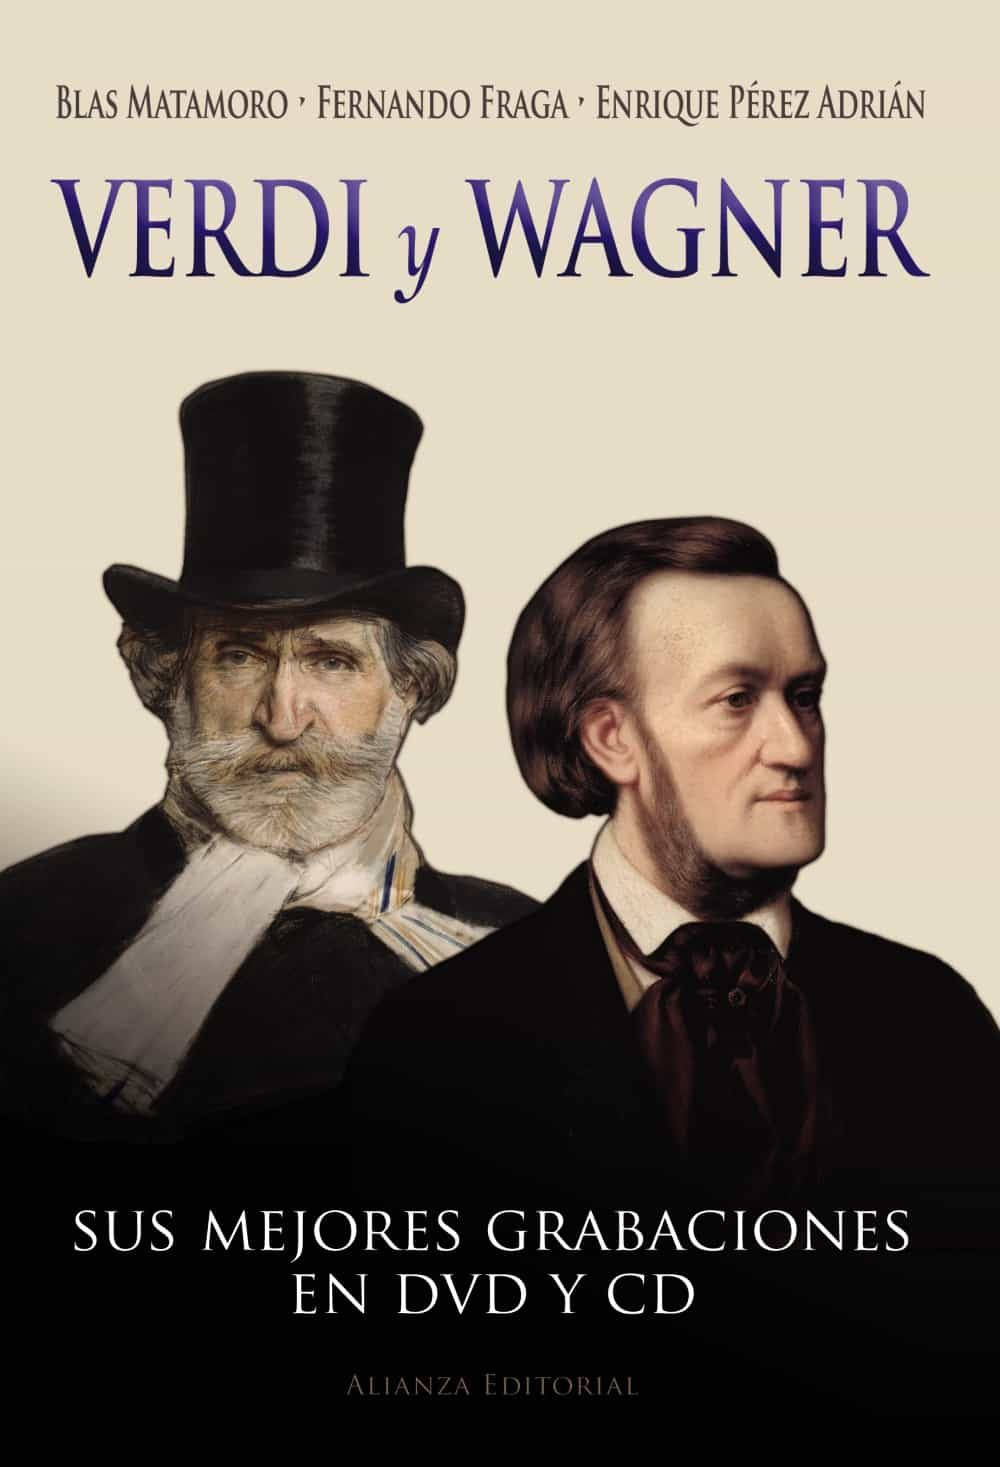 Verdi Y Wagner por Blas Matamoro;                                                                                    Fernando Fraga